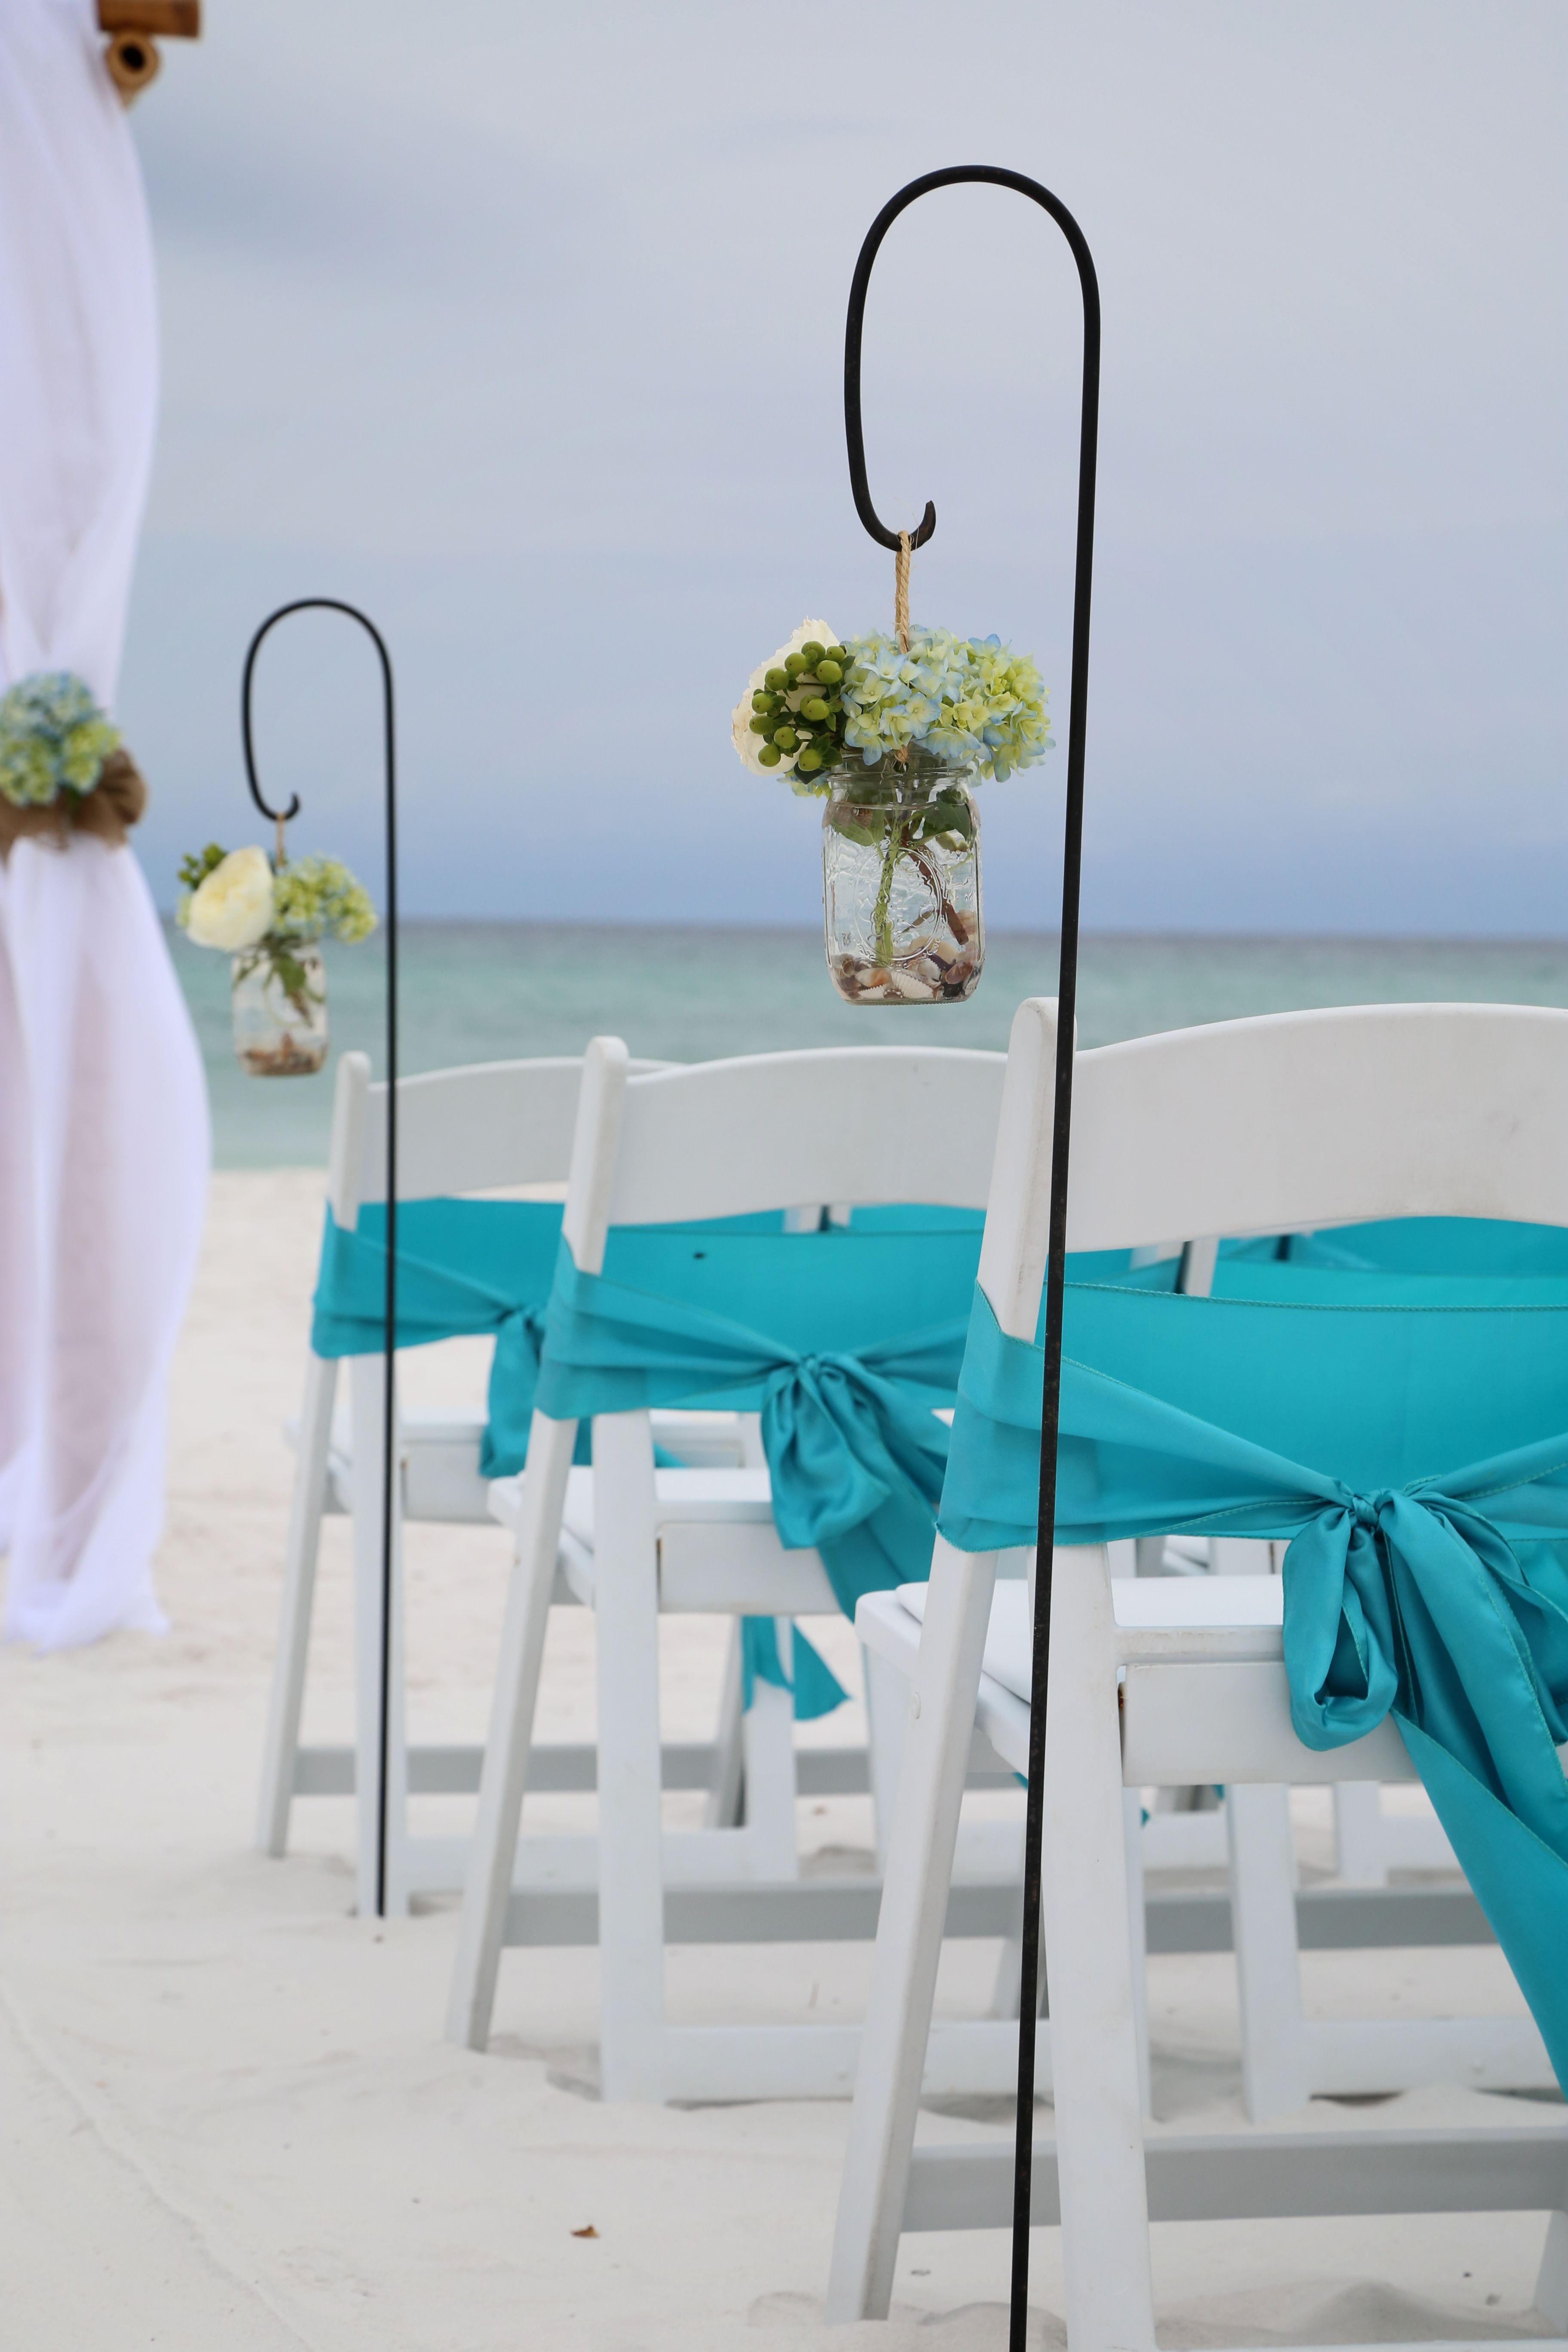 Destin Beach Weddings Wedding Planners Florida Cheap Photographer Elope In Panama City FL